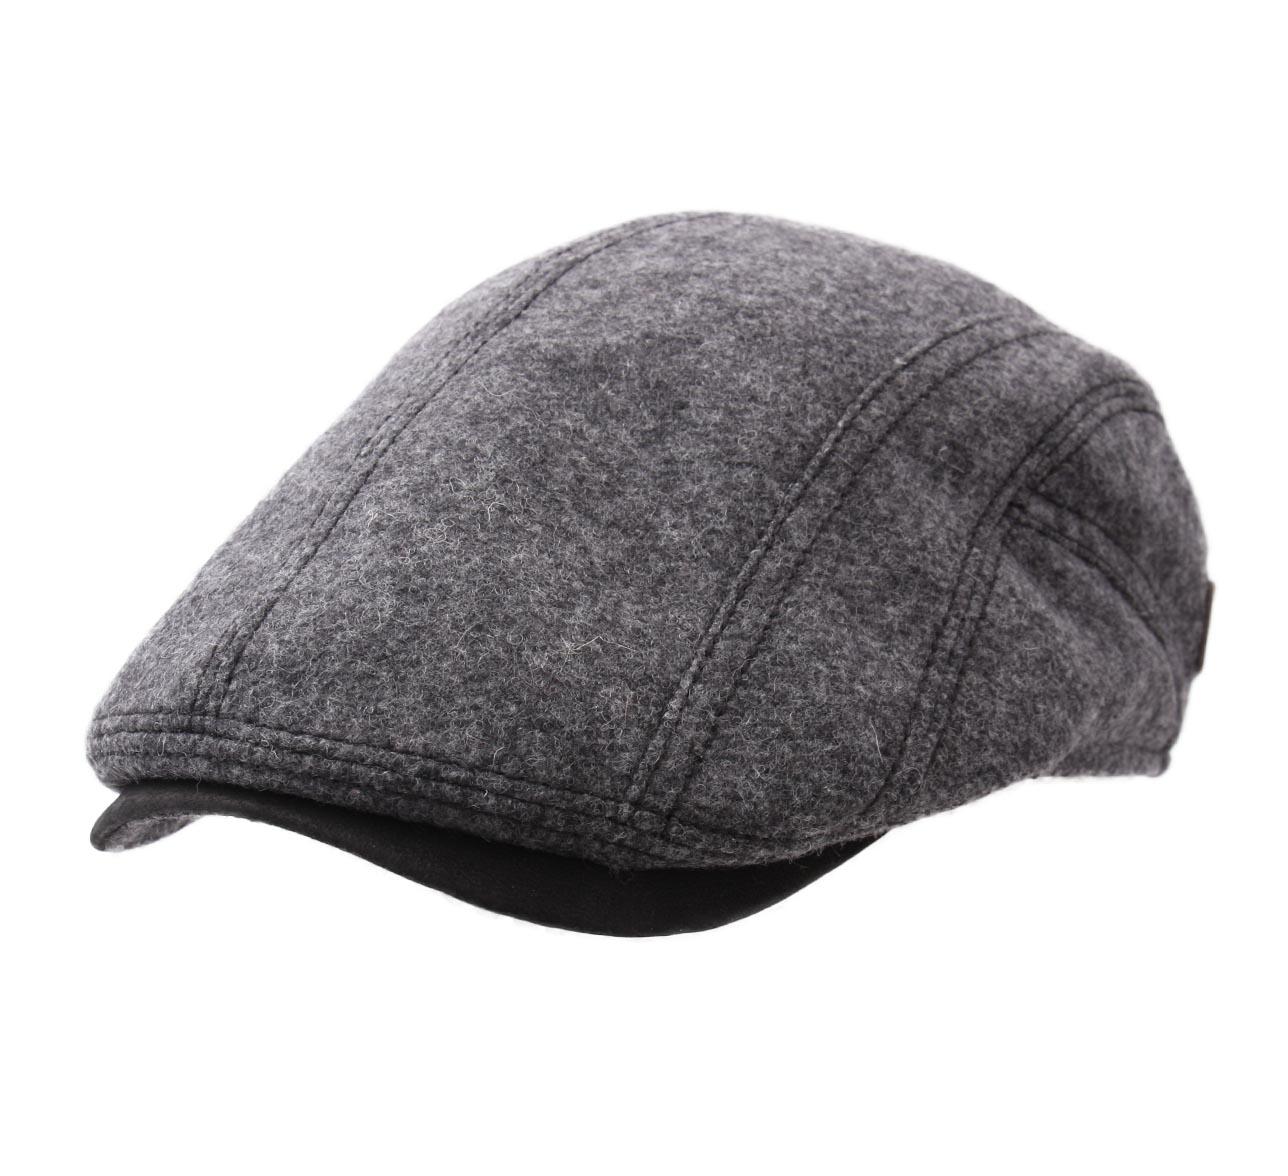 wholesale outlet order online official images chapeau homme anglais,chapeau homme anglais